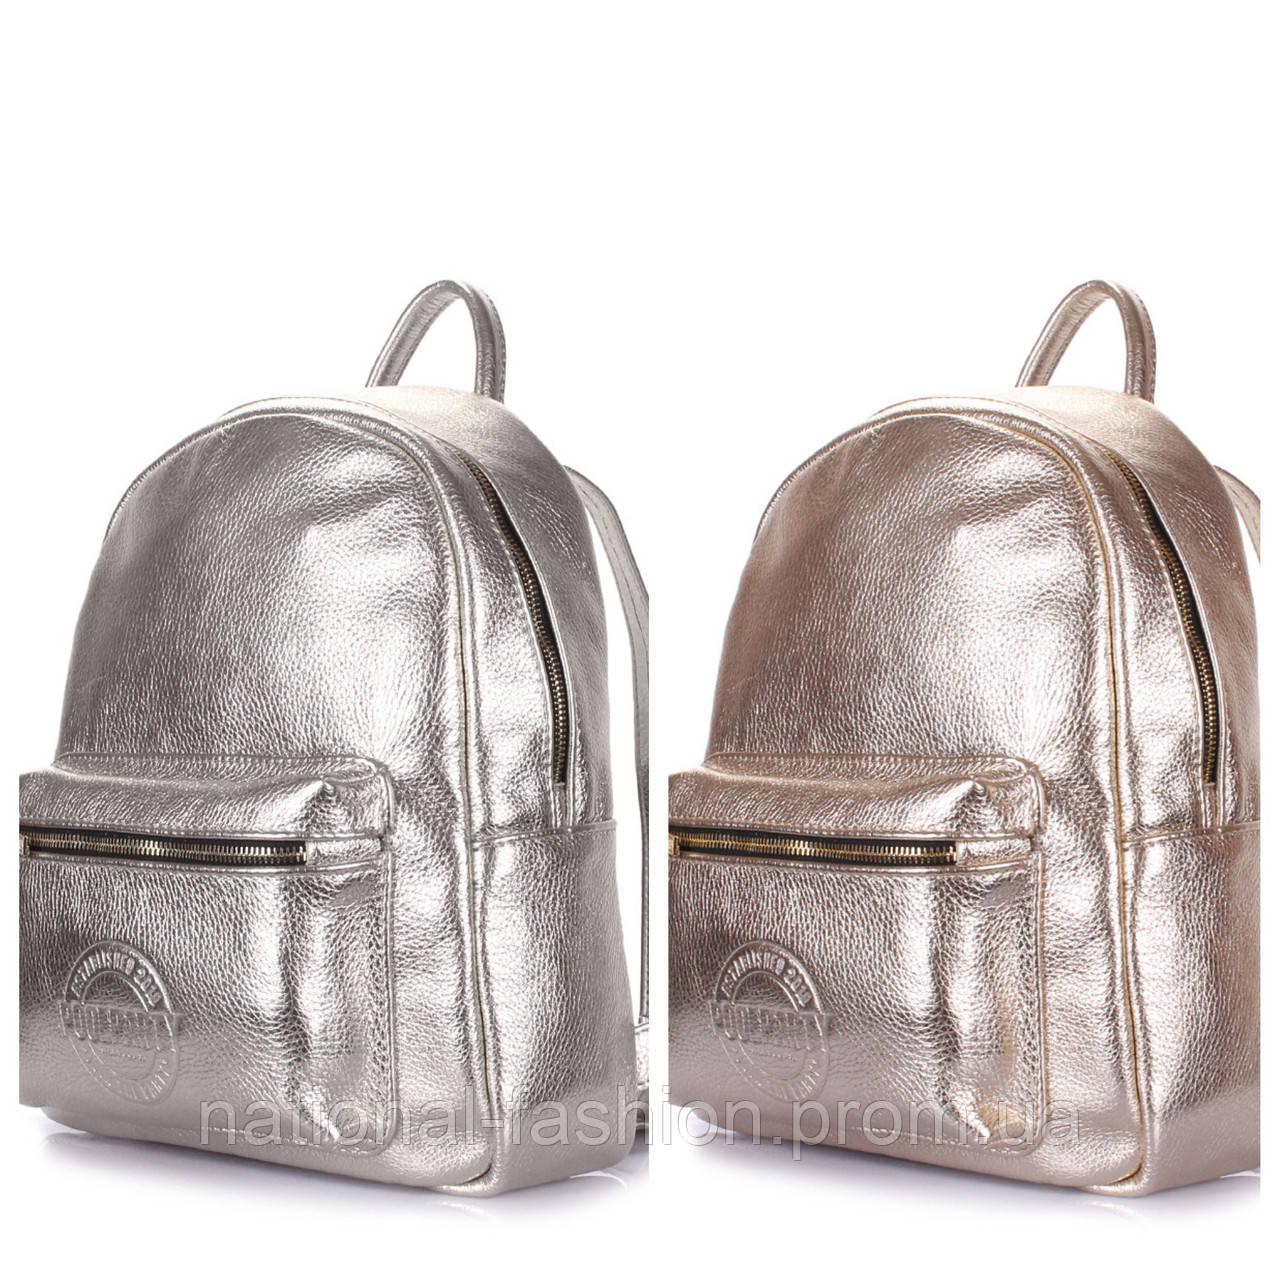 93d5b6fbda80 Рюкзак женский кожаный POOLPARTY Xs (золото\серебро) - Интернет-магазин